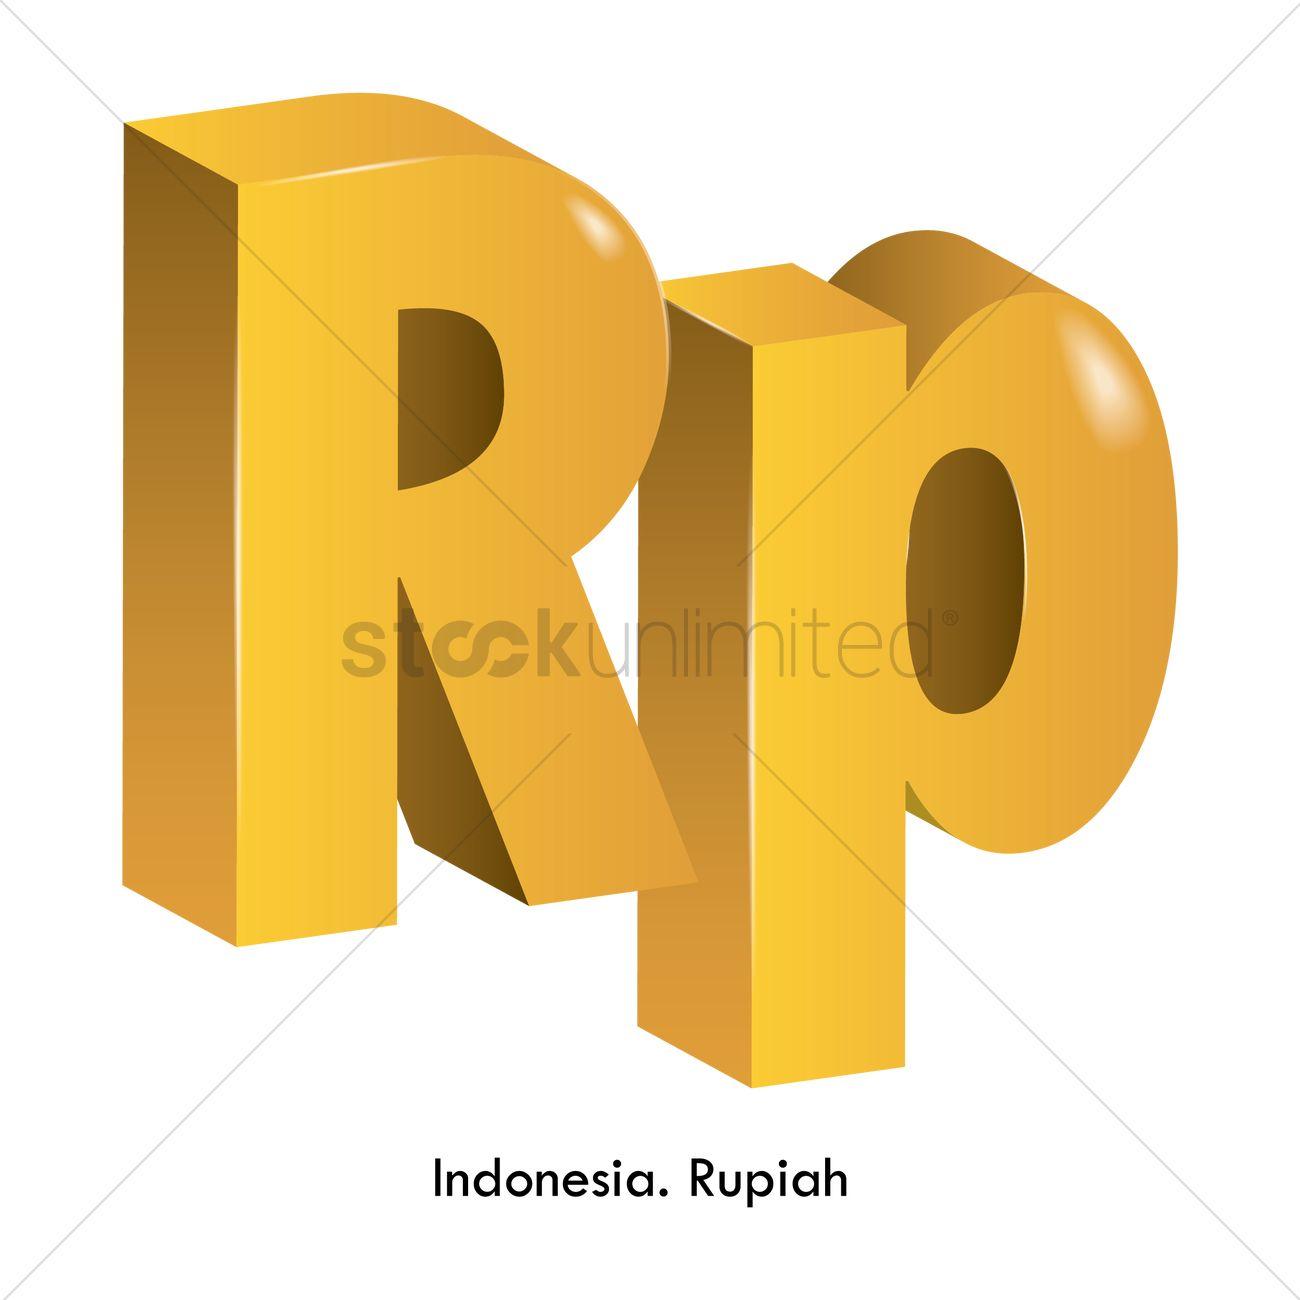 Icon icons symbol symbols sign signs money economy economies rupiah currency biocorpaavc Gallery